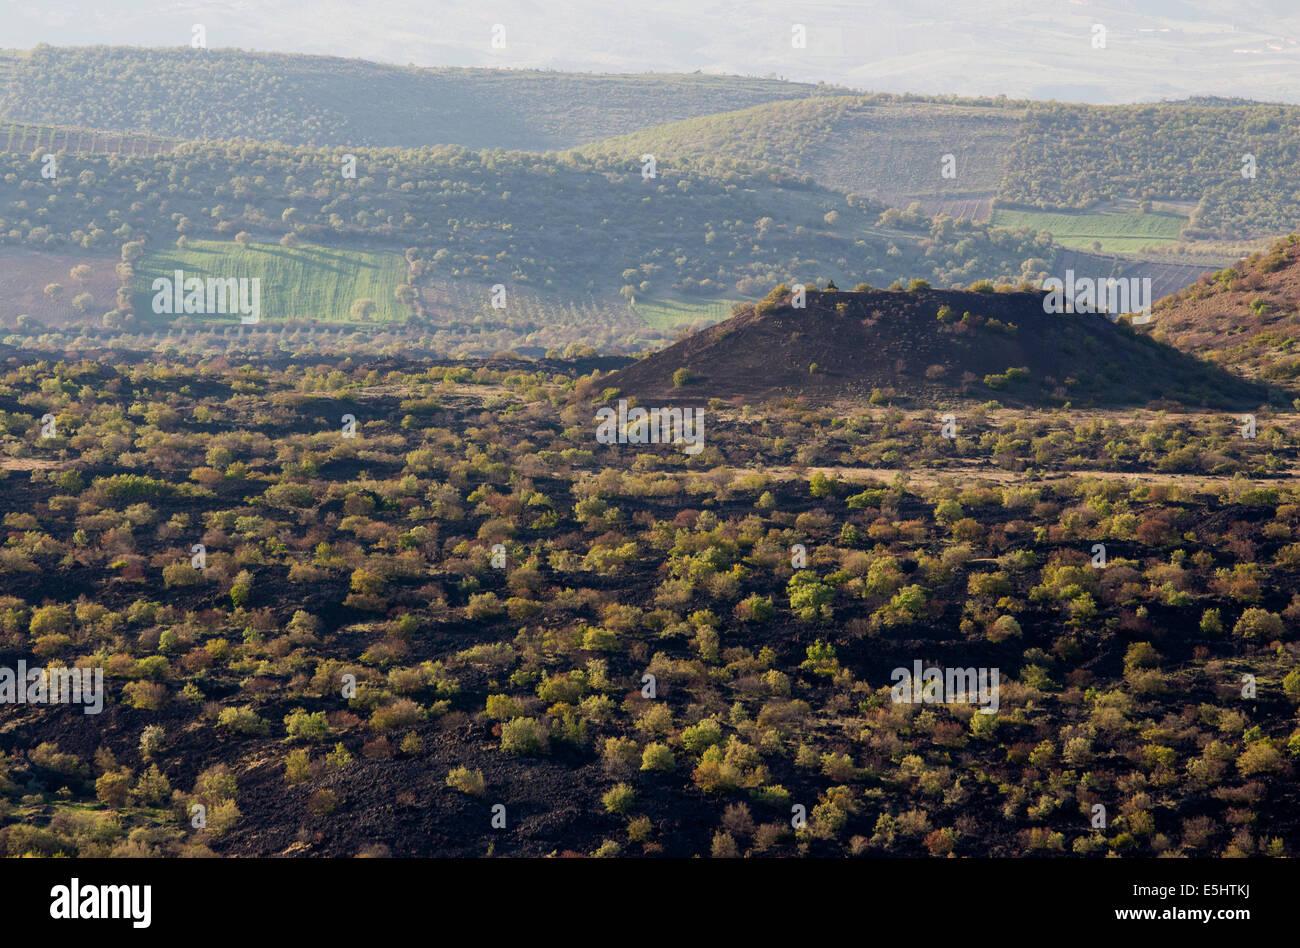 Kaplan volcanic cone Geological Park Manisa Turkey - Stock Image